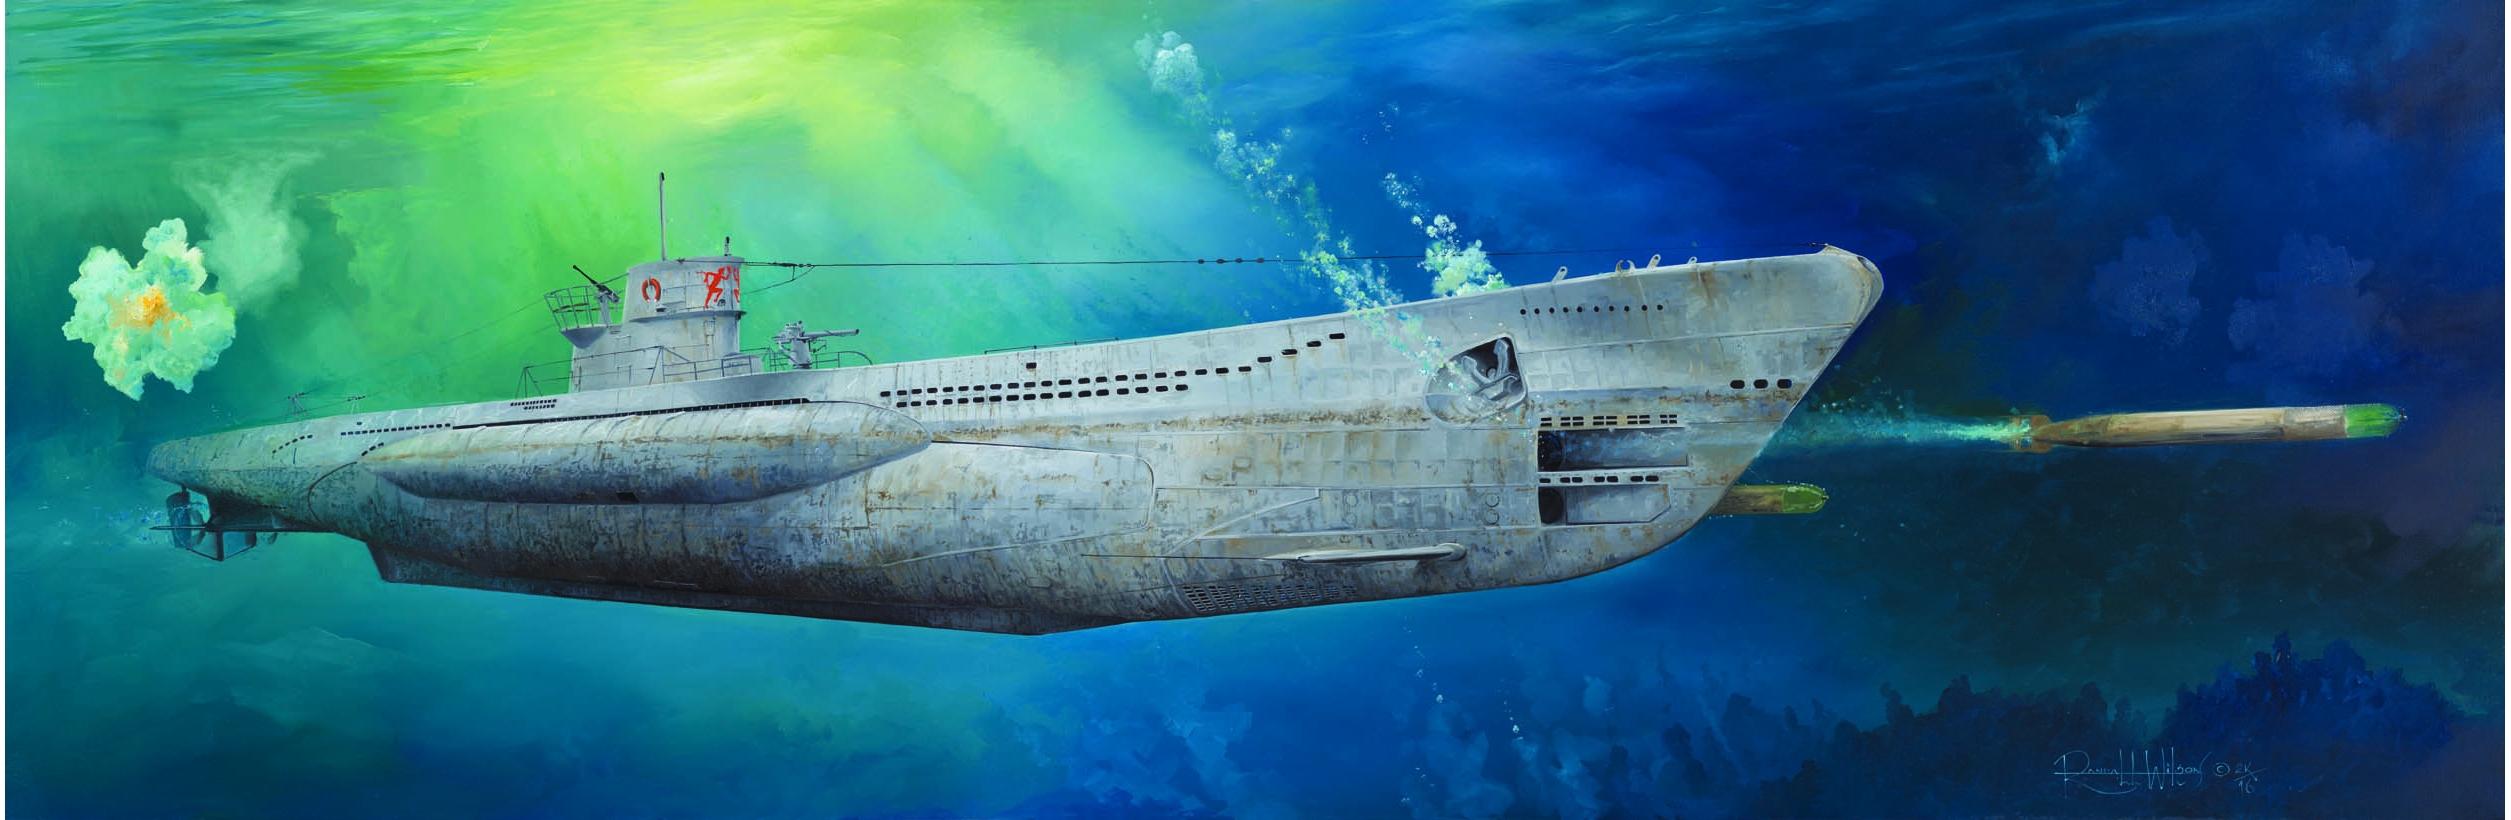 рисунок German Type VIIC U-Boat U-552